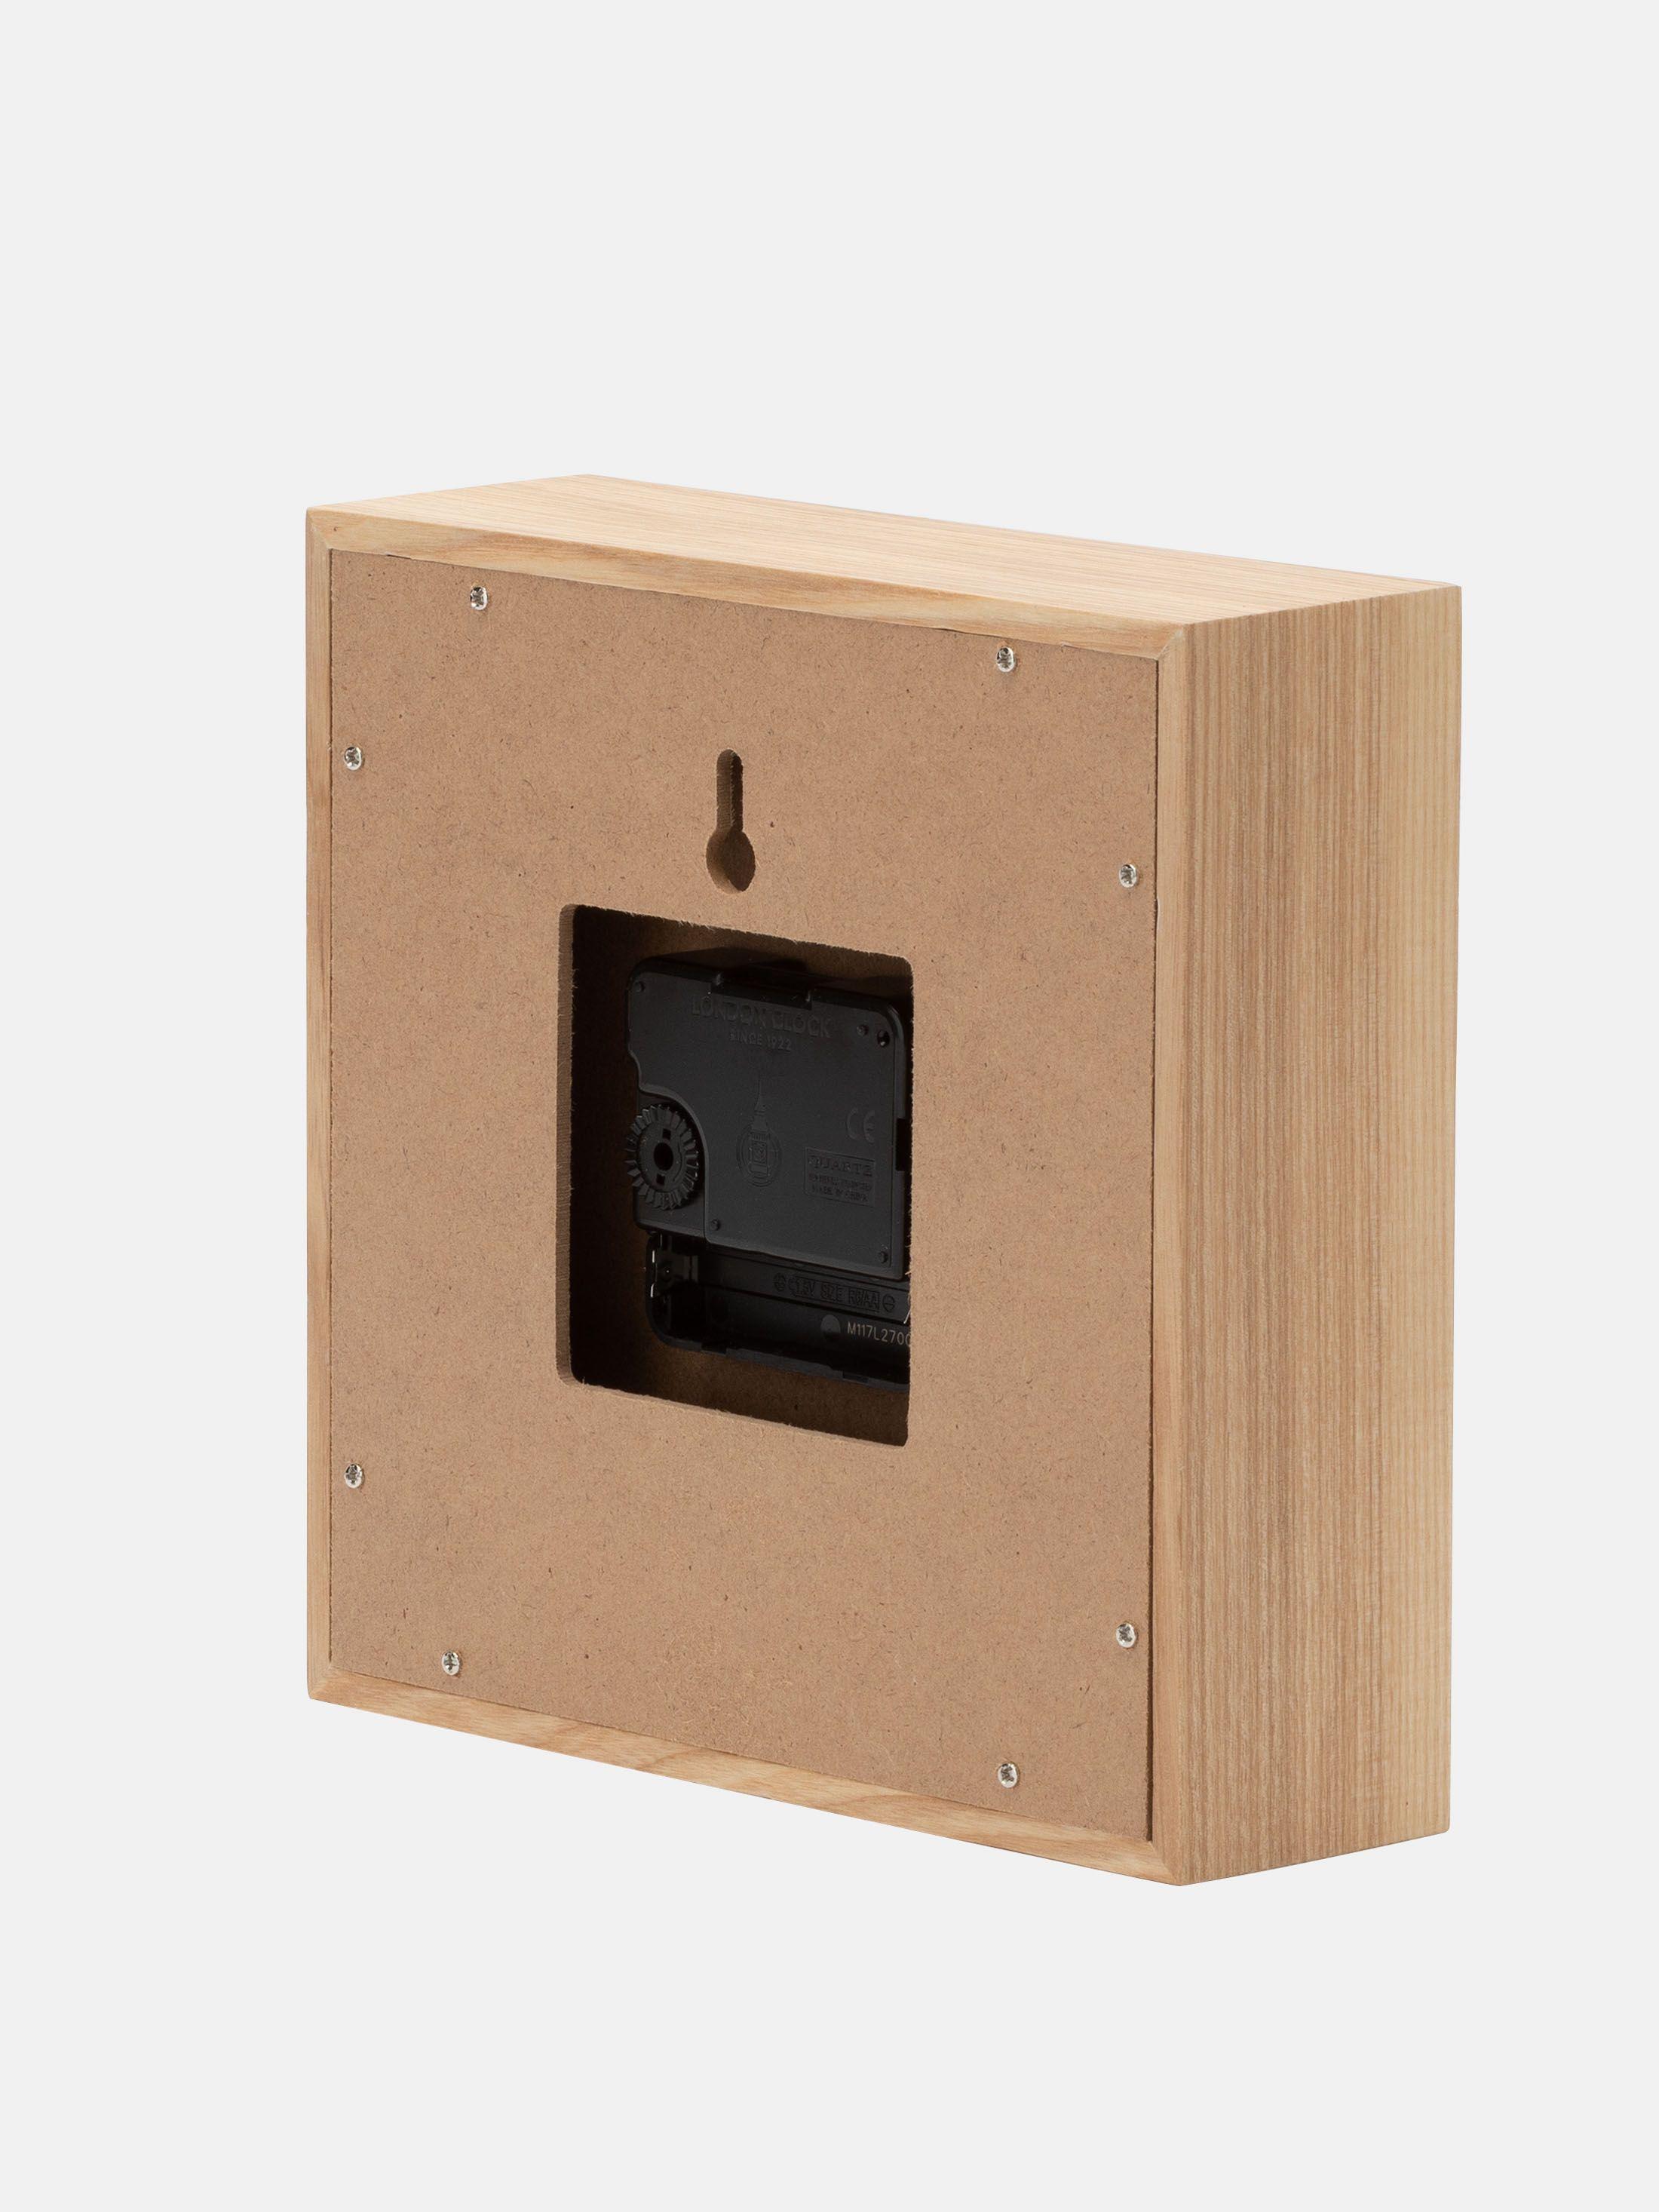 design you own square clock